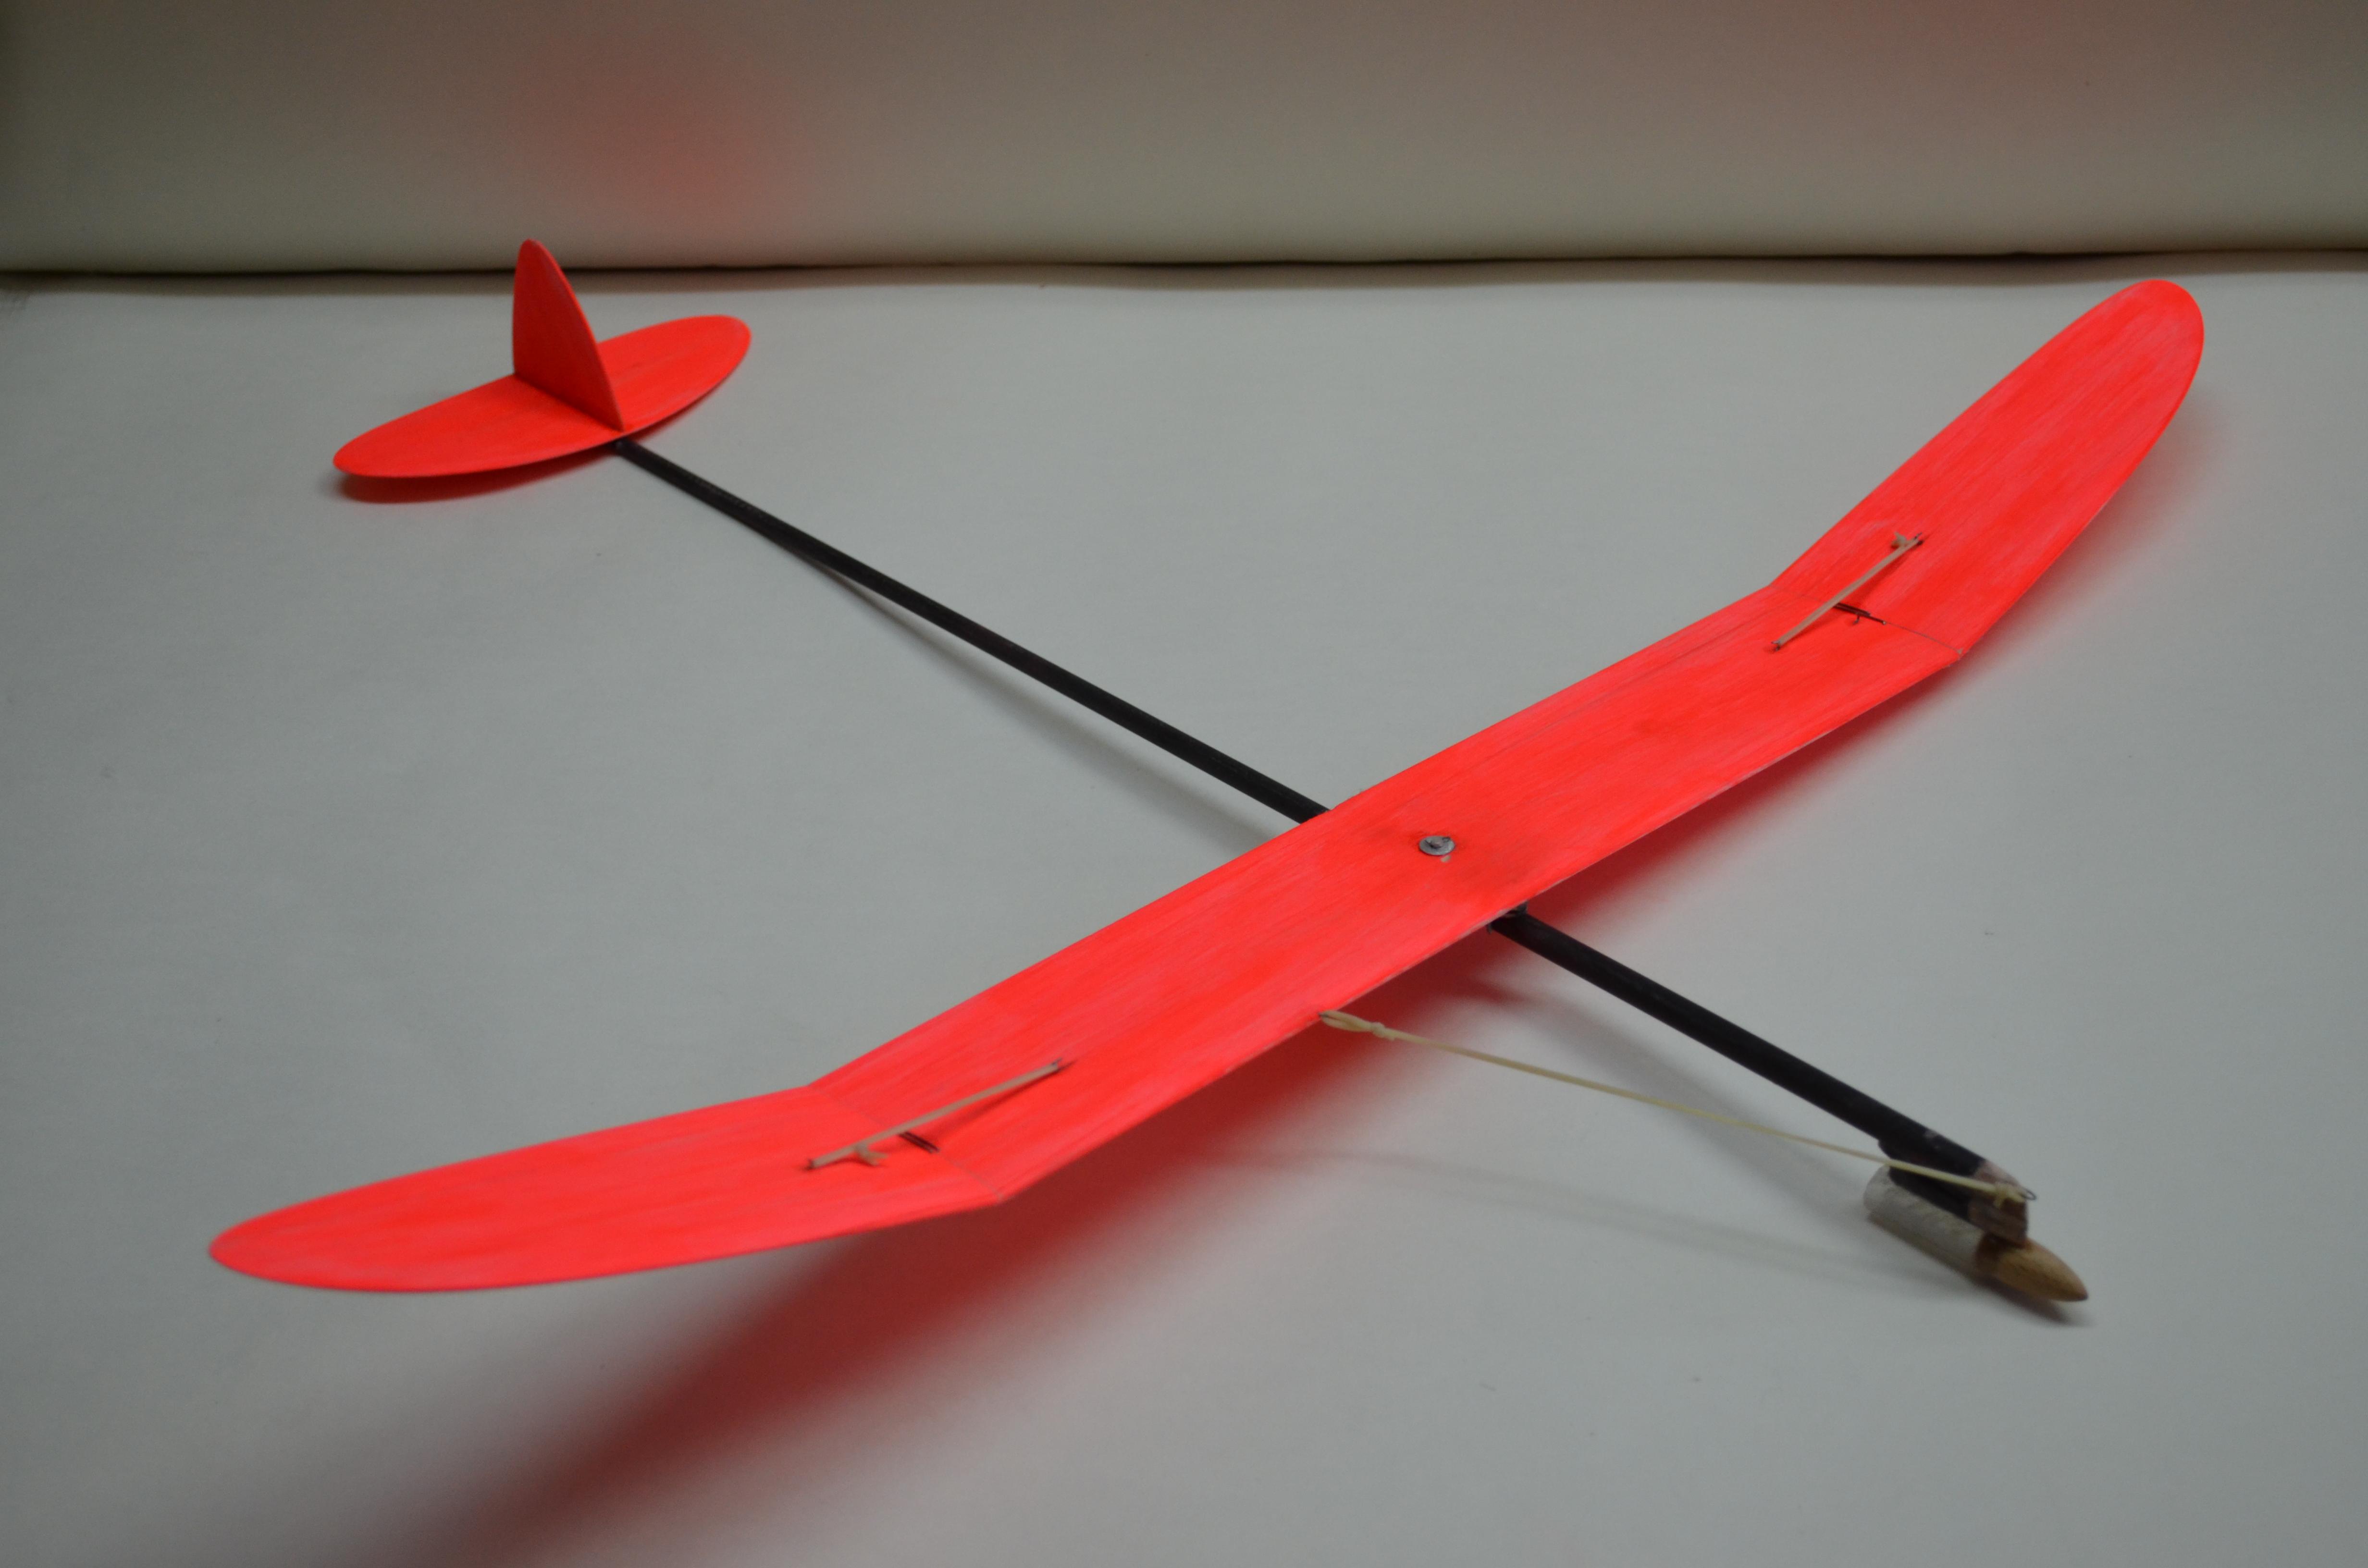 Rocketglider models